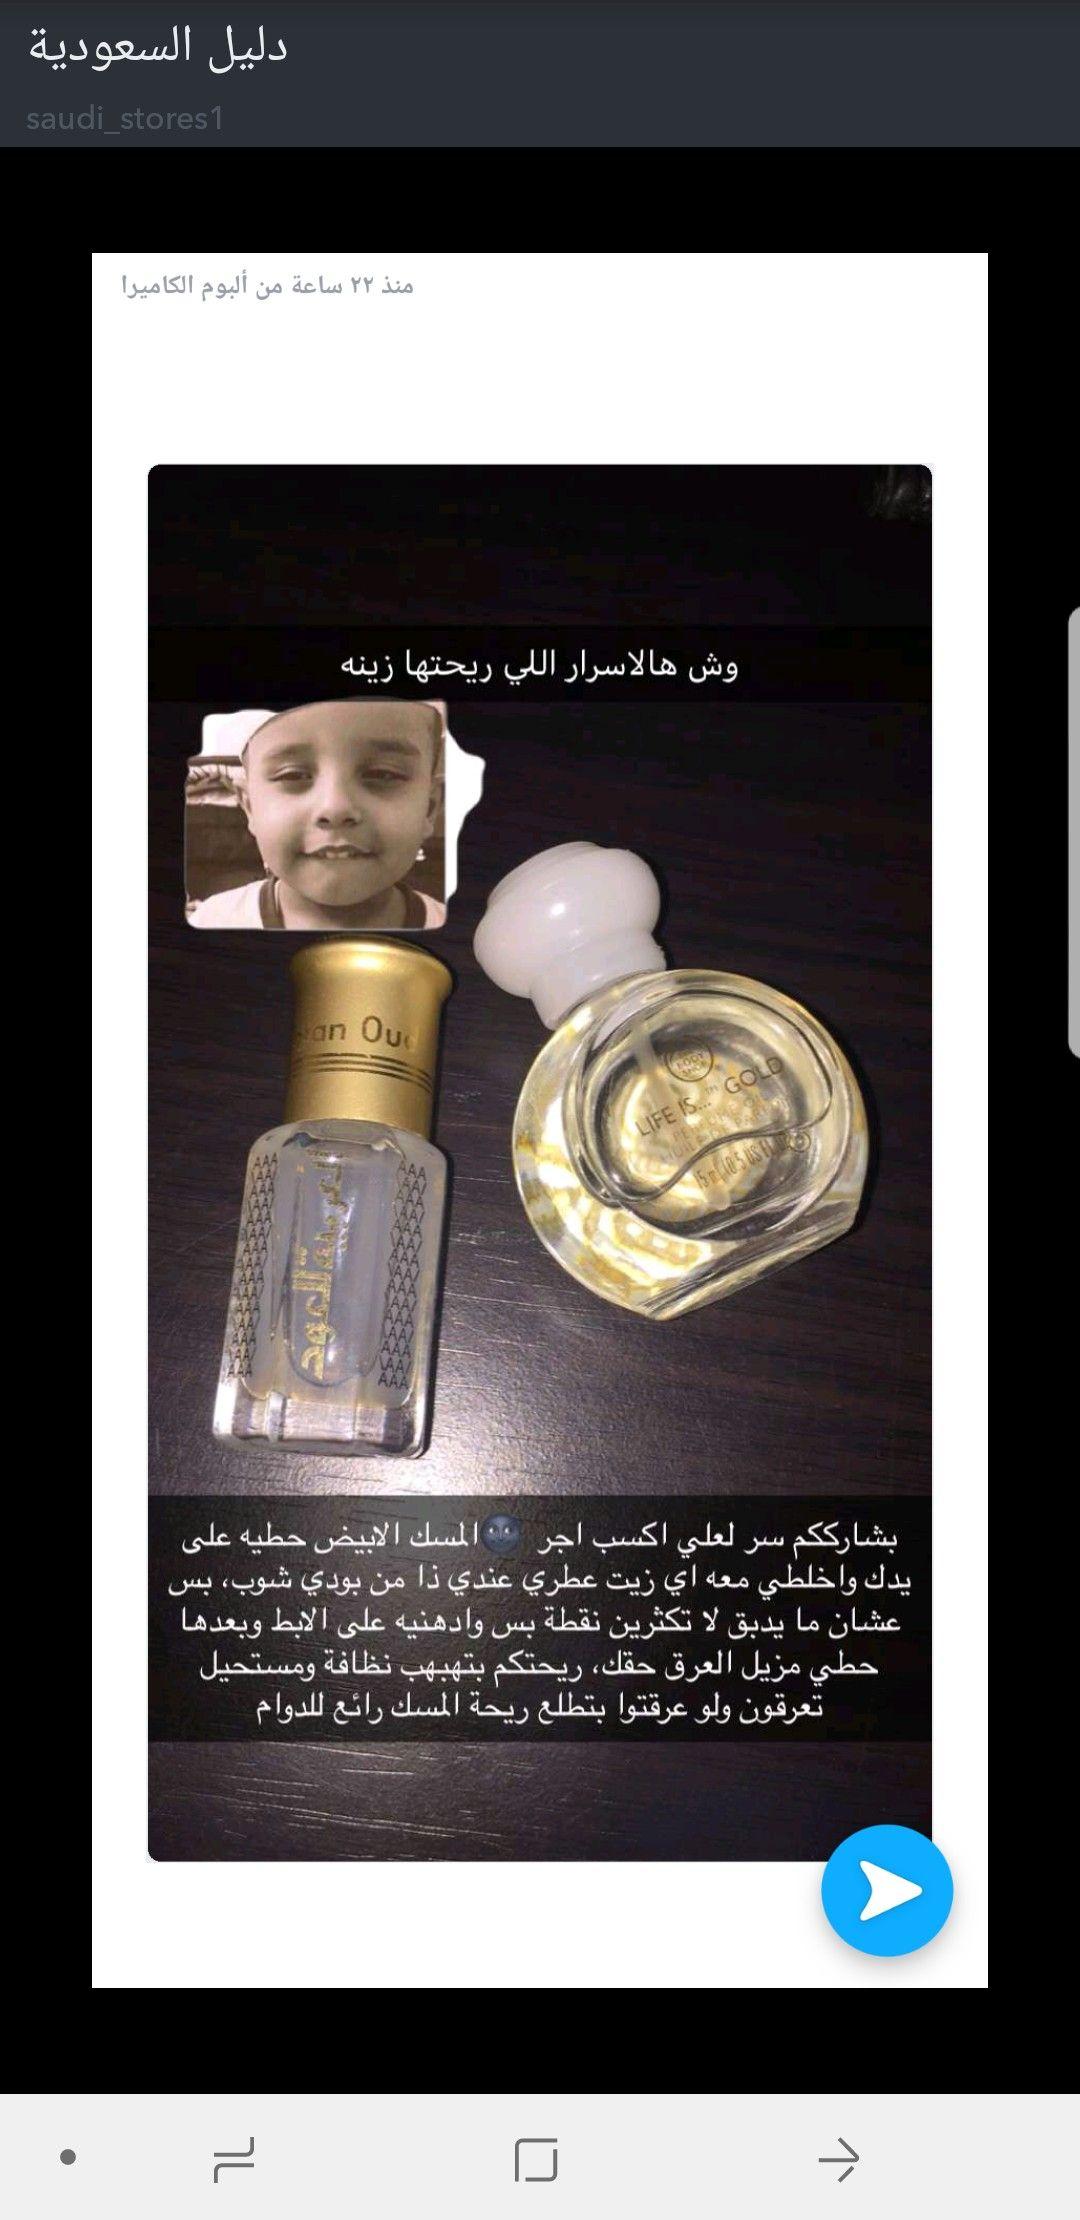 Pin By Ritaj On عطور وبخور وشموع Hair Perfume Diy Skin Care Help Beauty Perfume